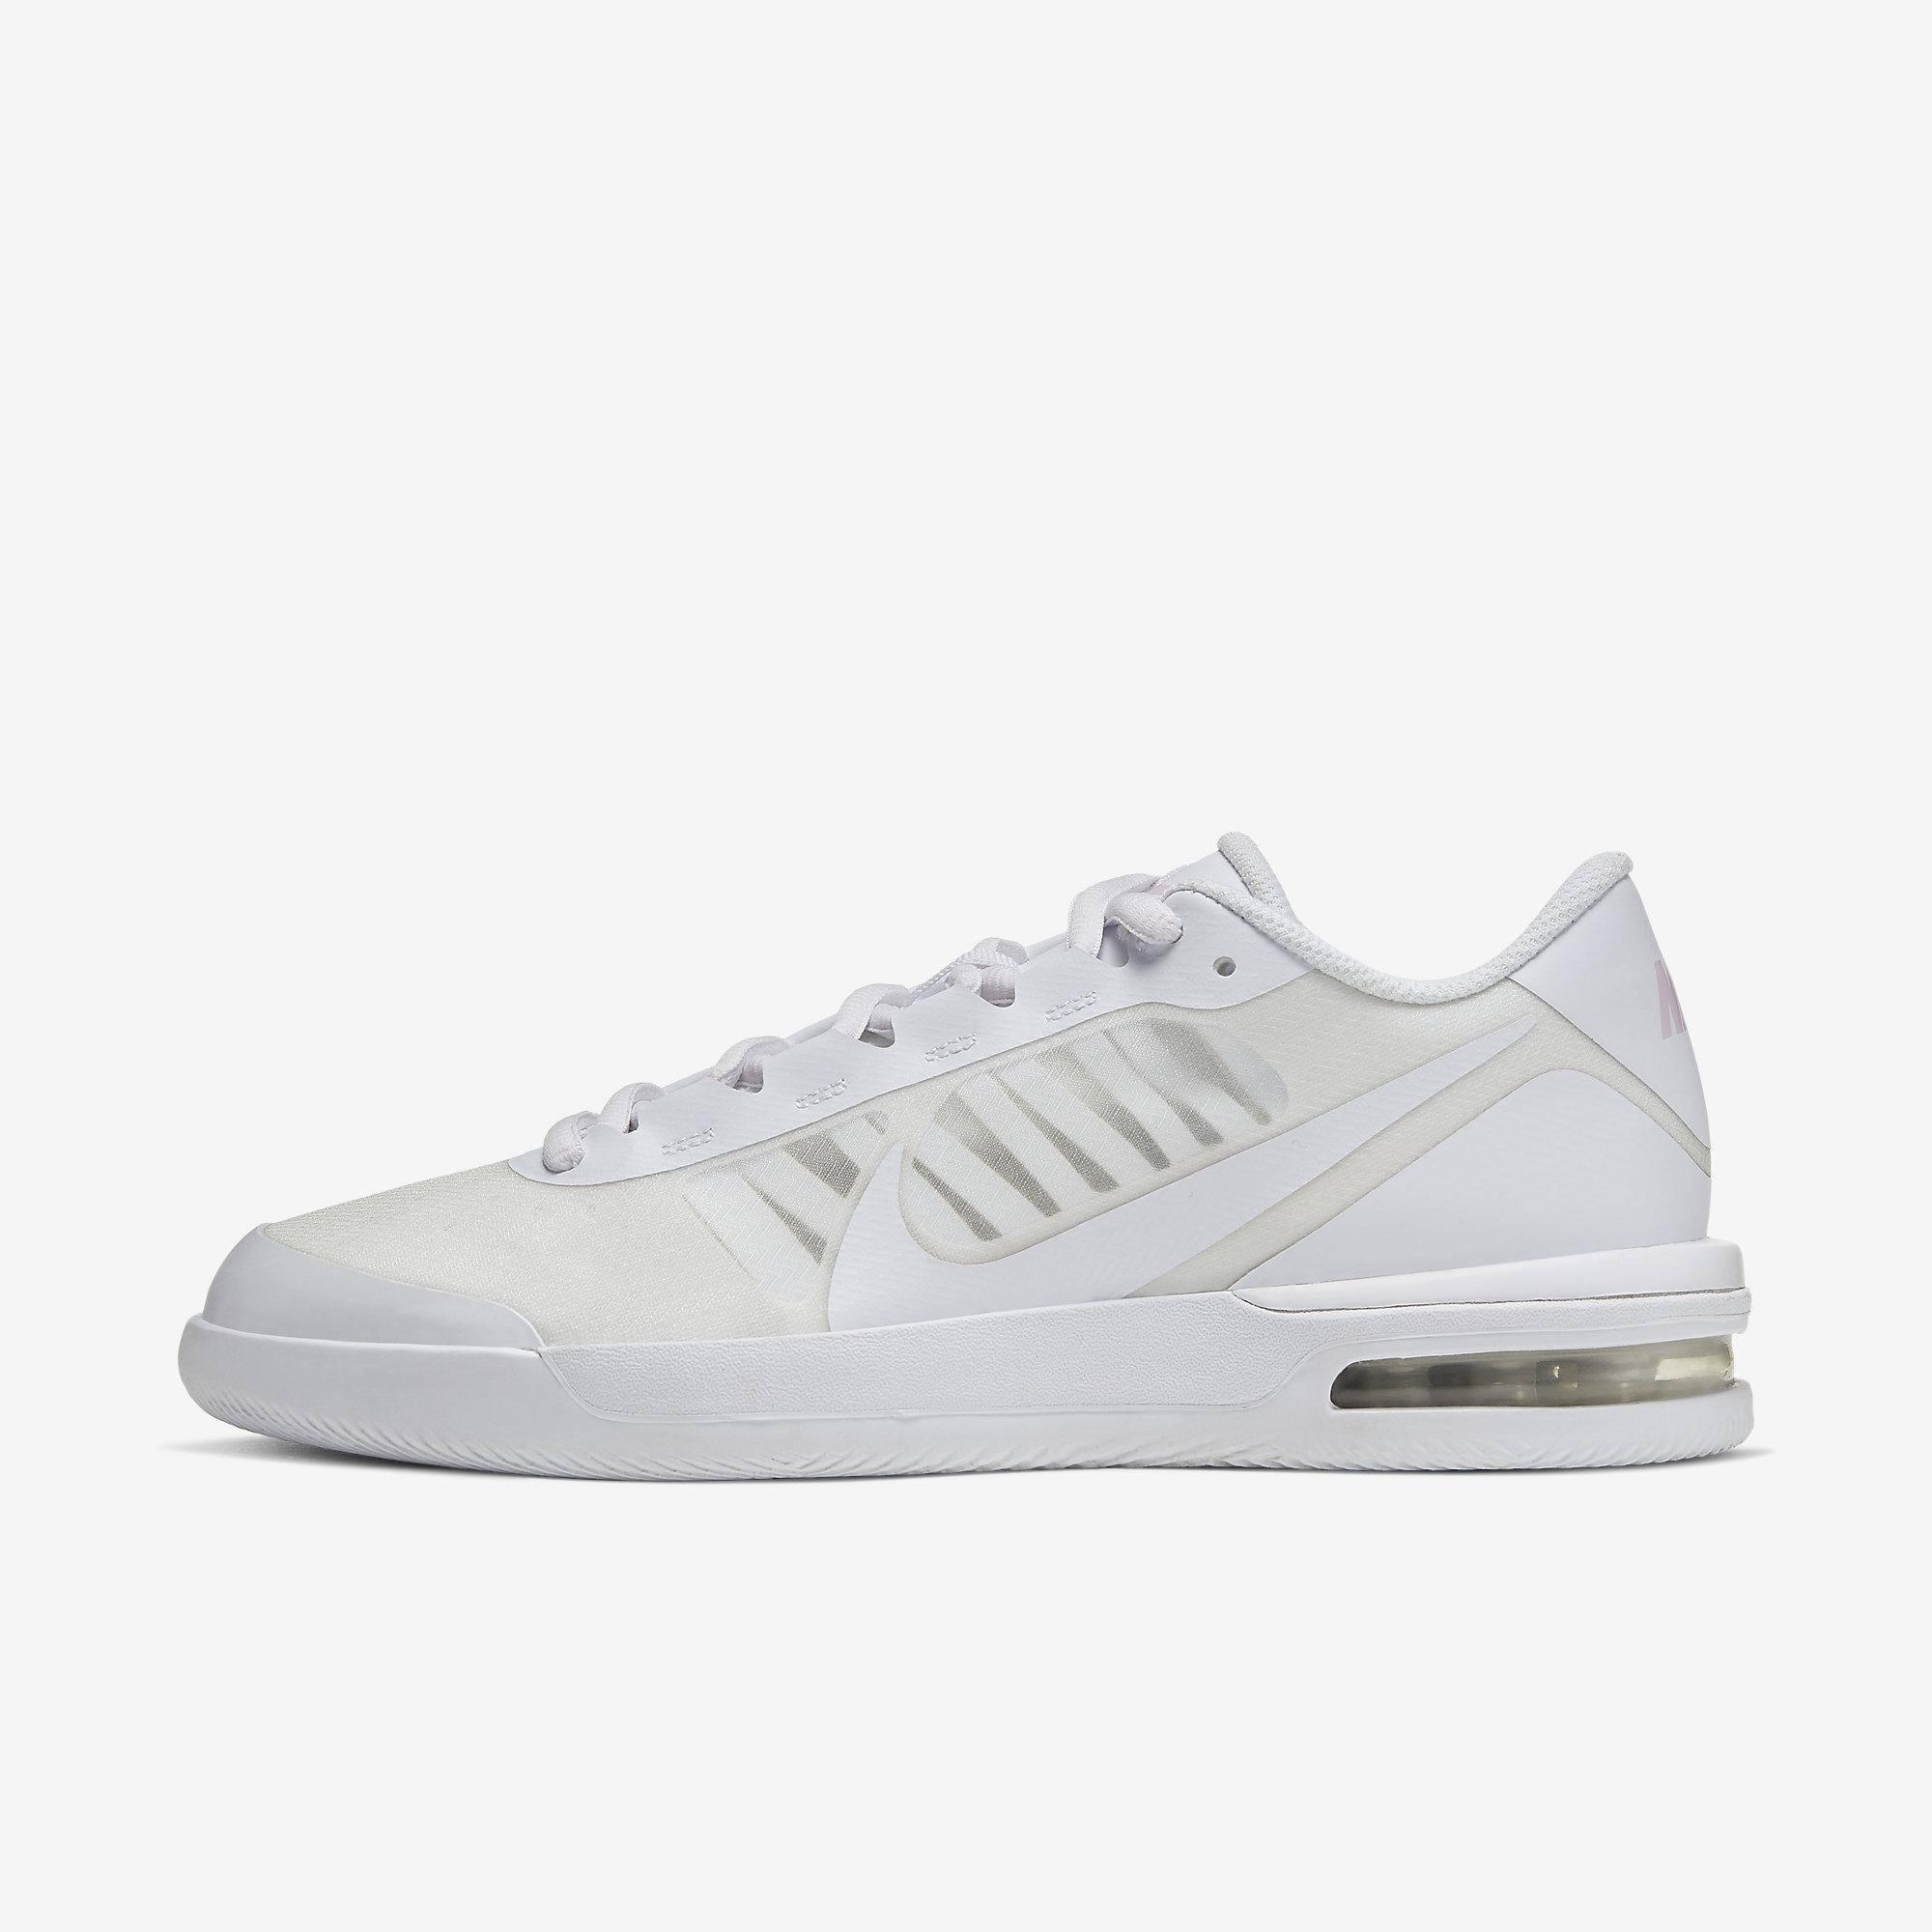 NikeCourt Air Max Vapor Wing MS Women Tennis Shoes White  dRHBdx8